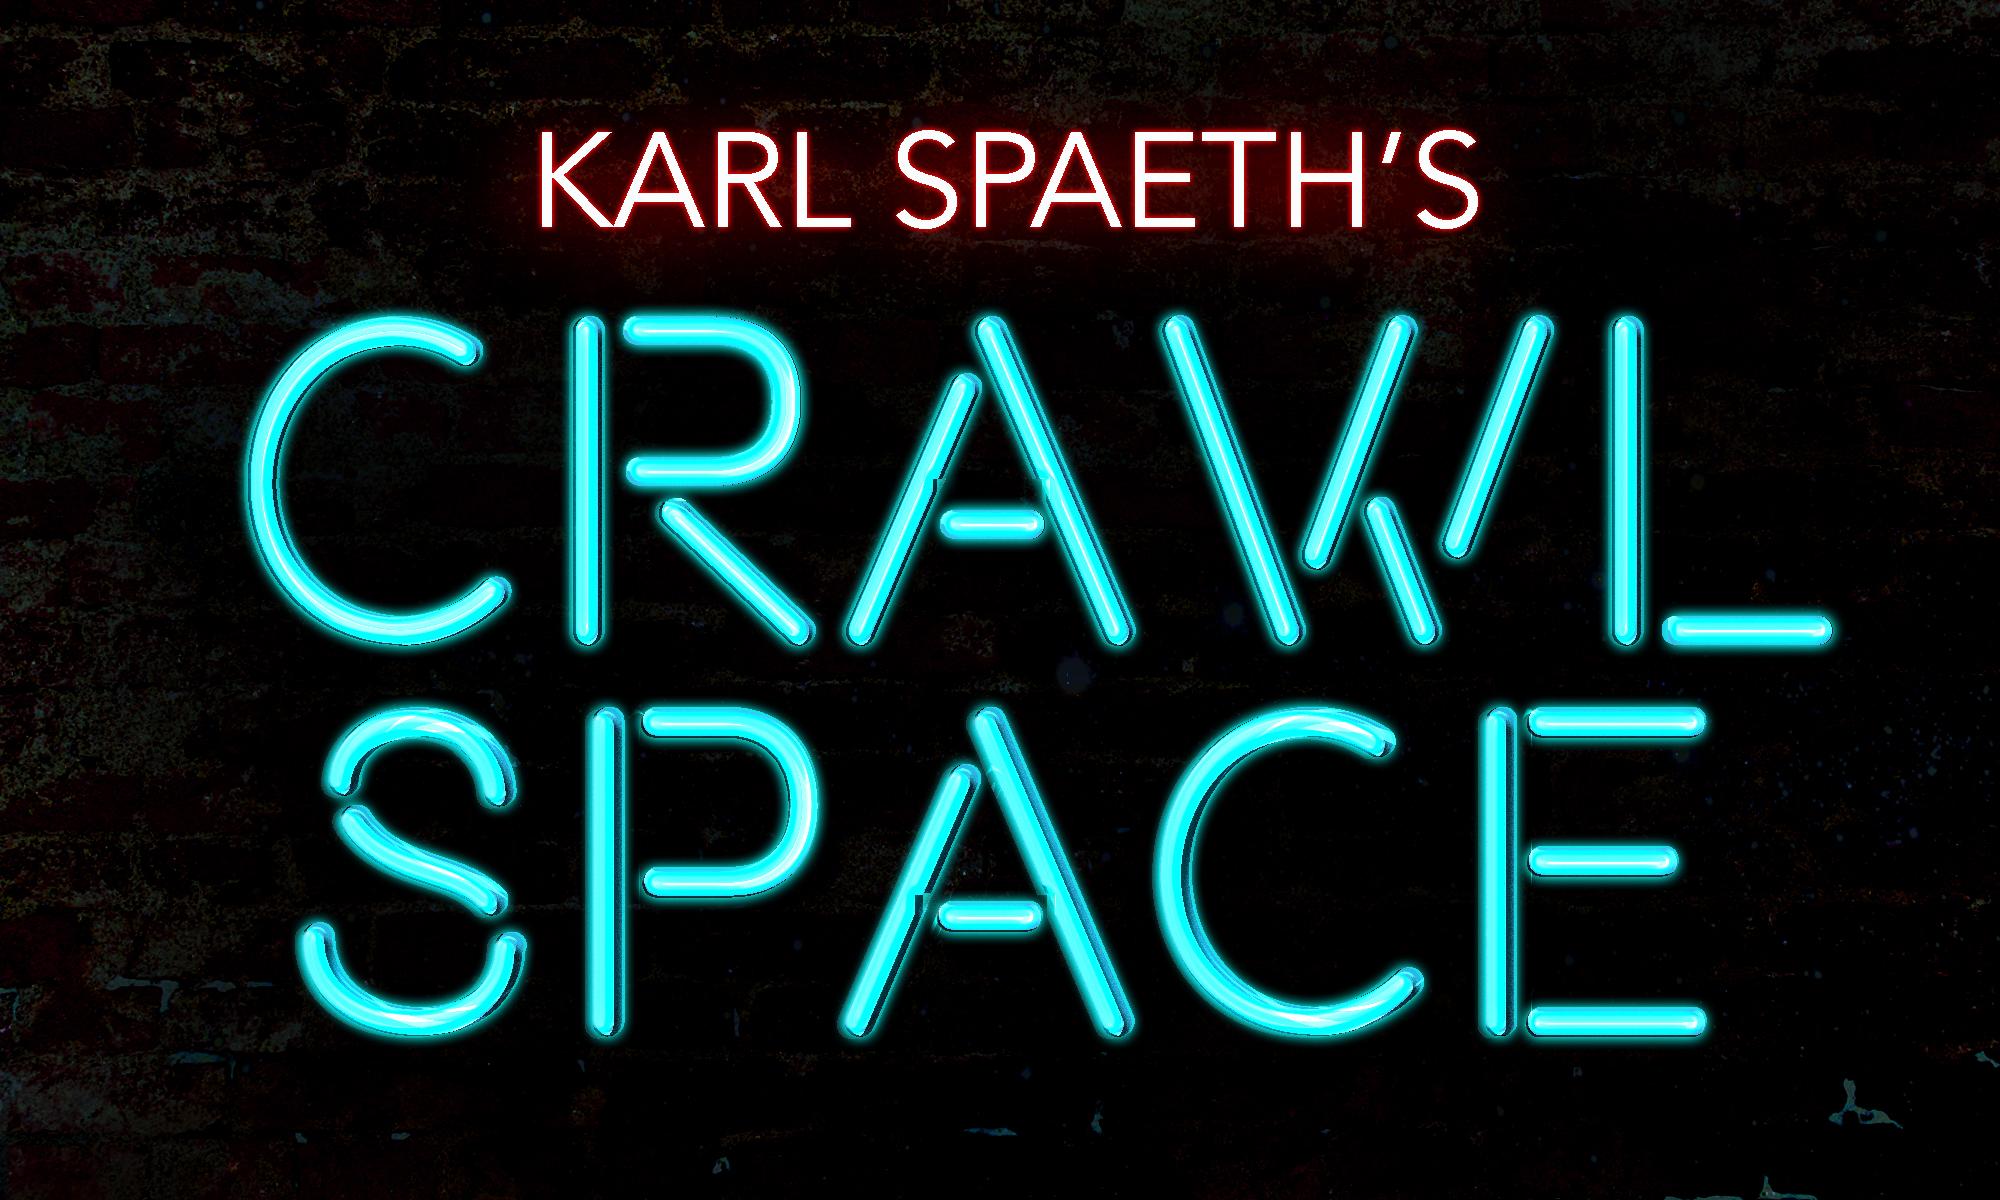 Karl Spaeth's Crawl Space